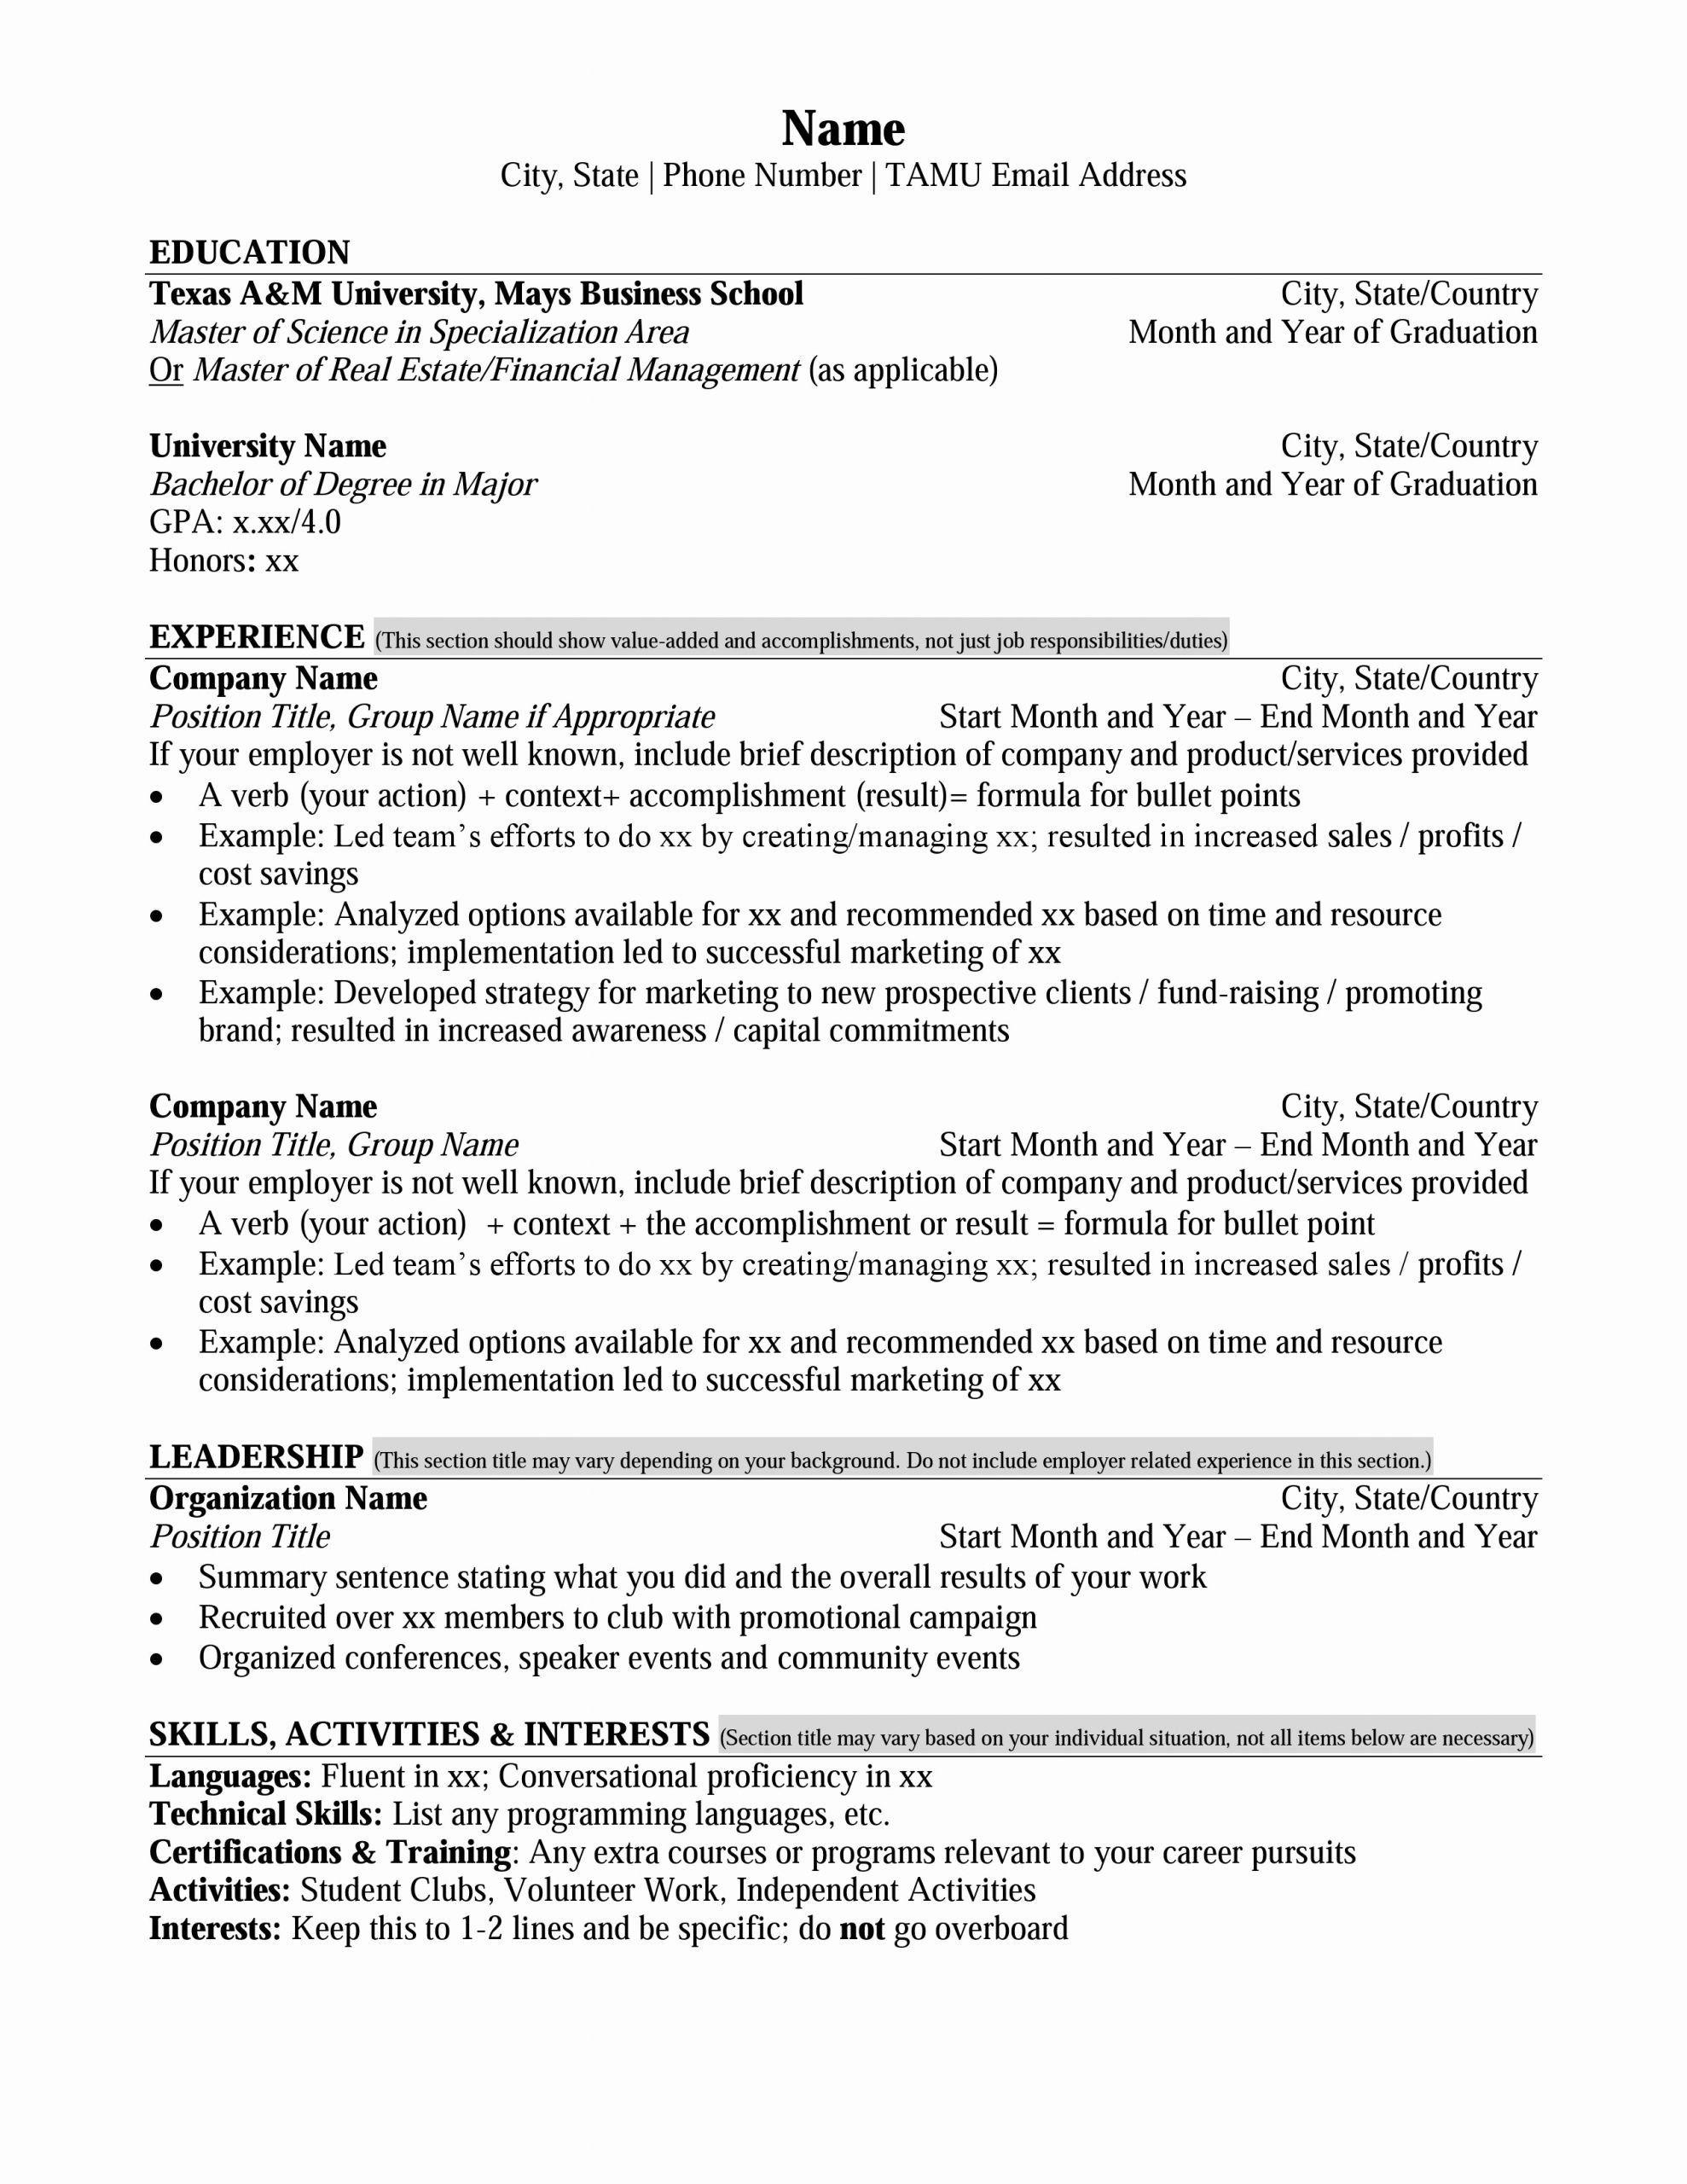 Phd Industry Resume Example Beautiful Mays Masters Resume Format Career Management Center Job Resume Examples Medical Coder Resume Resume Guide